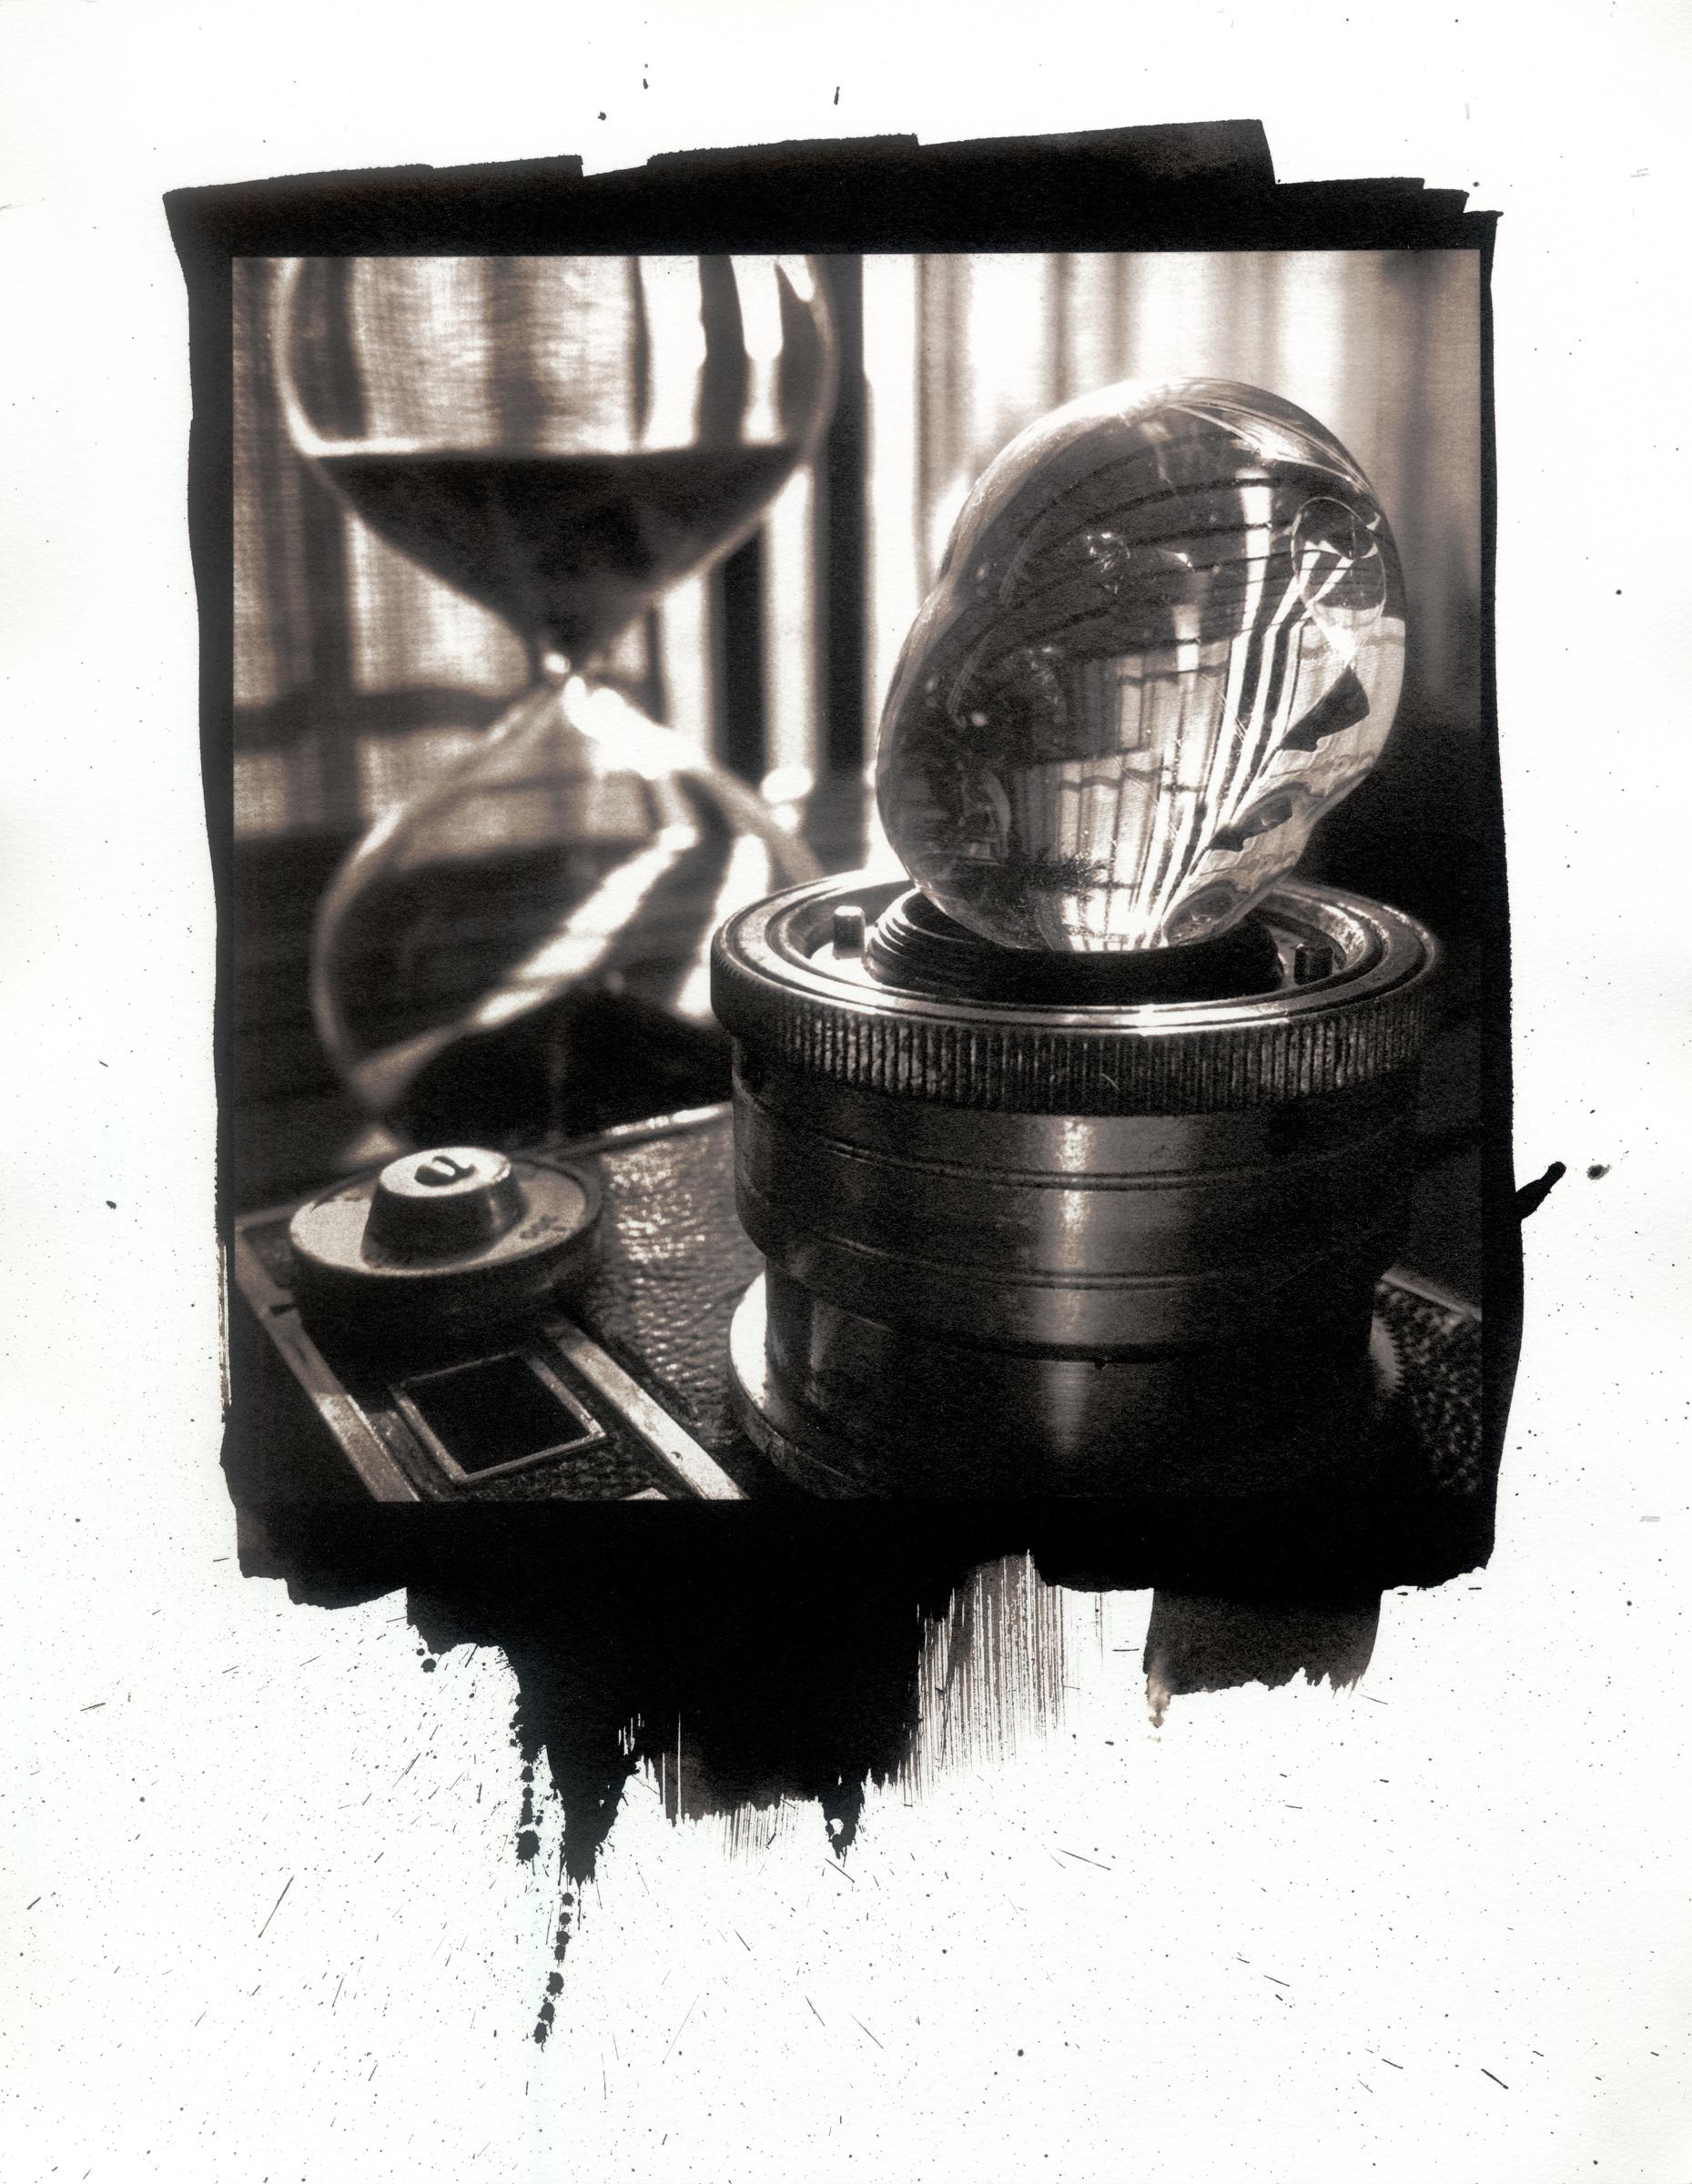 Time, Camera, Imagination - 11x14 Platinum Print